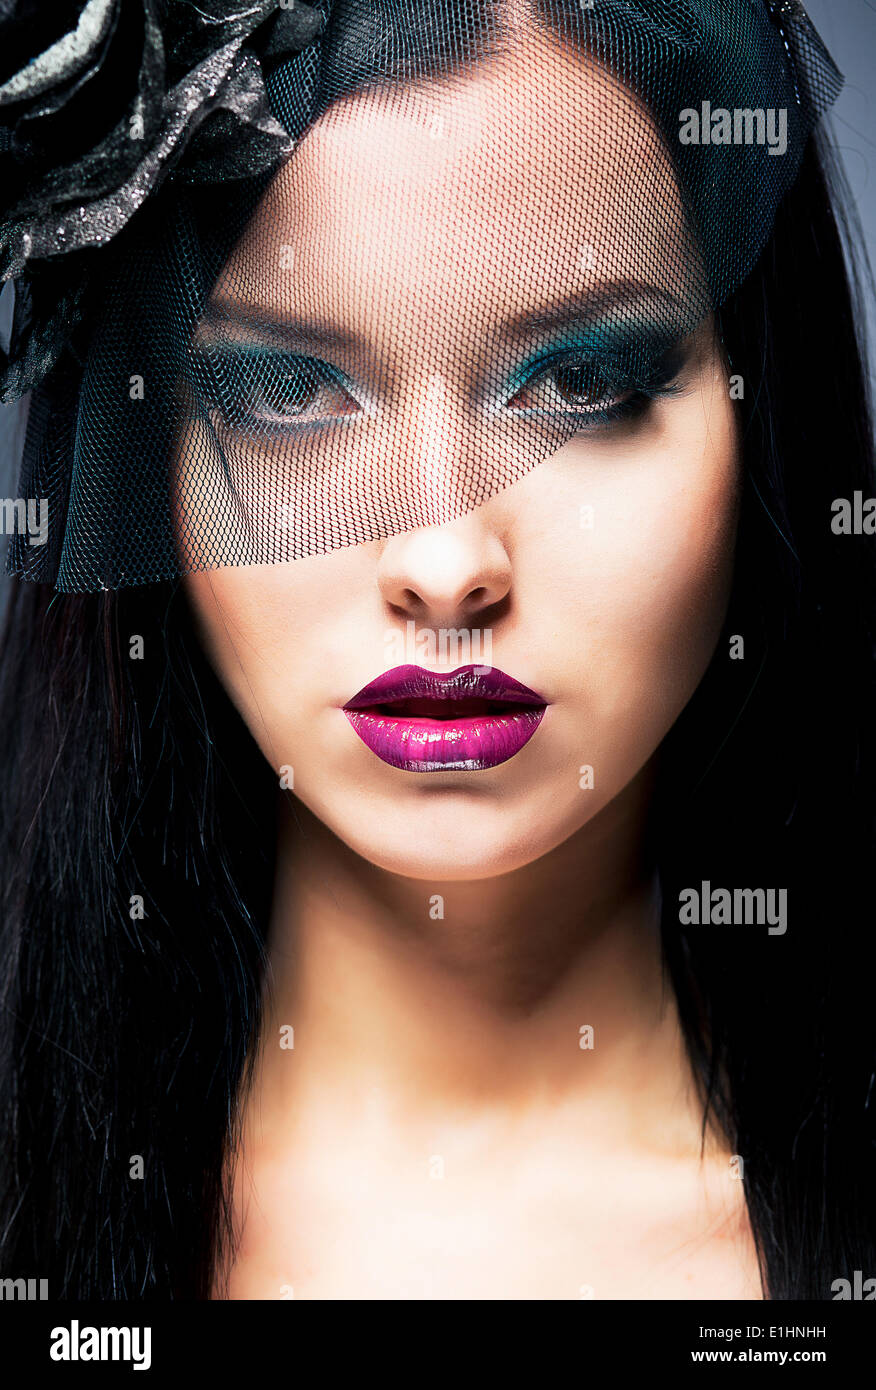 Cierre hembra viuda con negro velo de luto Imagen De Stock